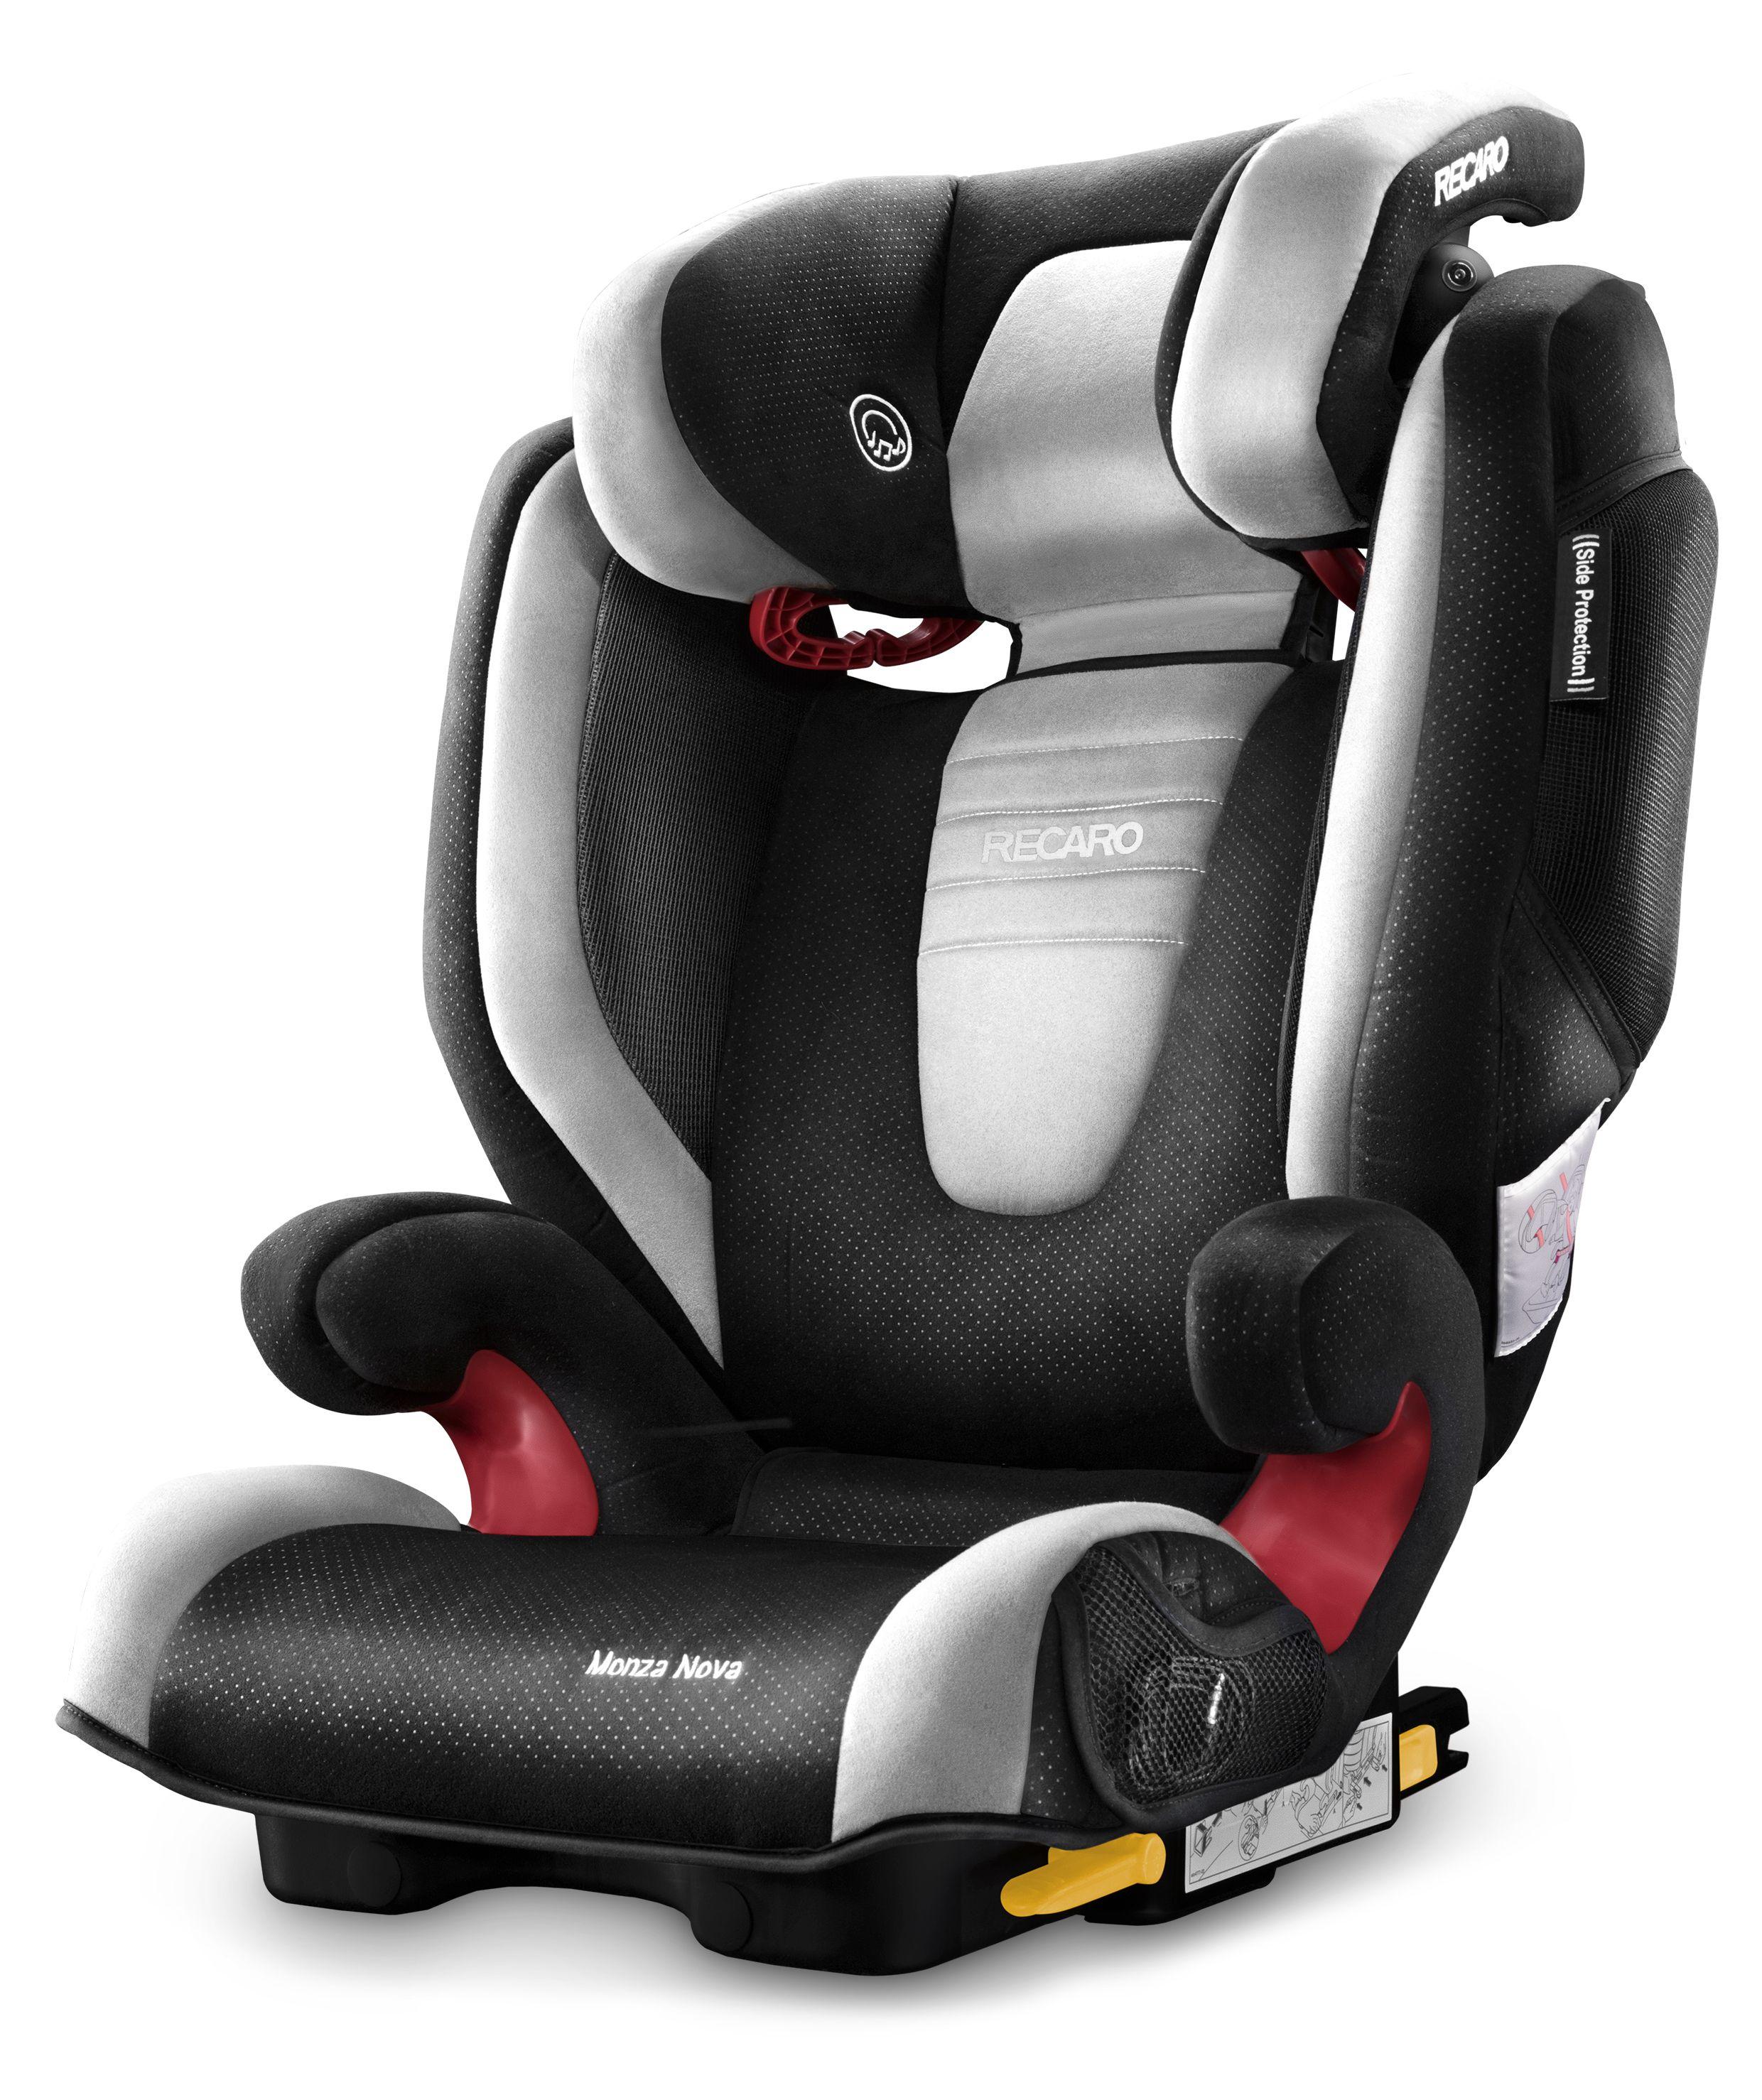 Siège auto Monza Nova 2 Seatfix